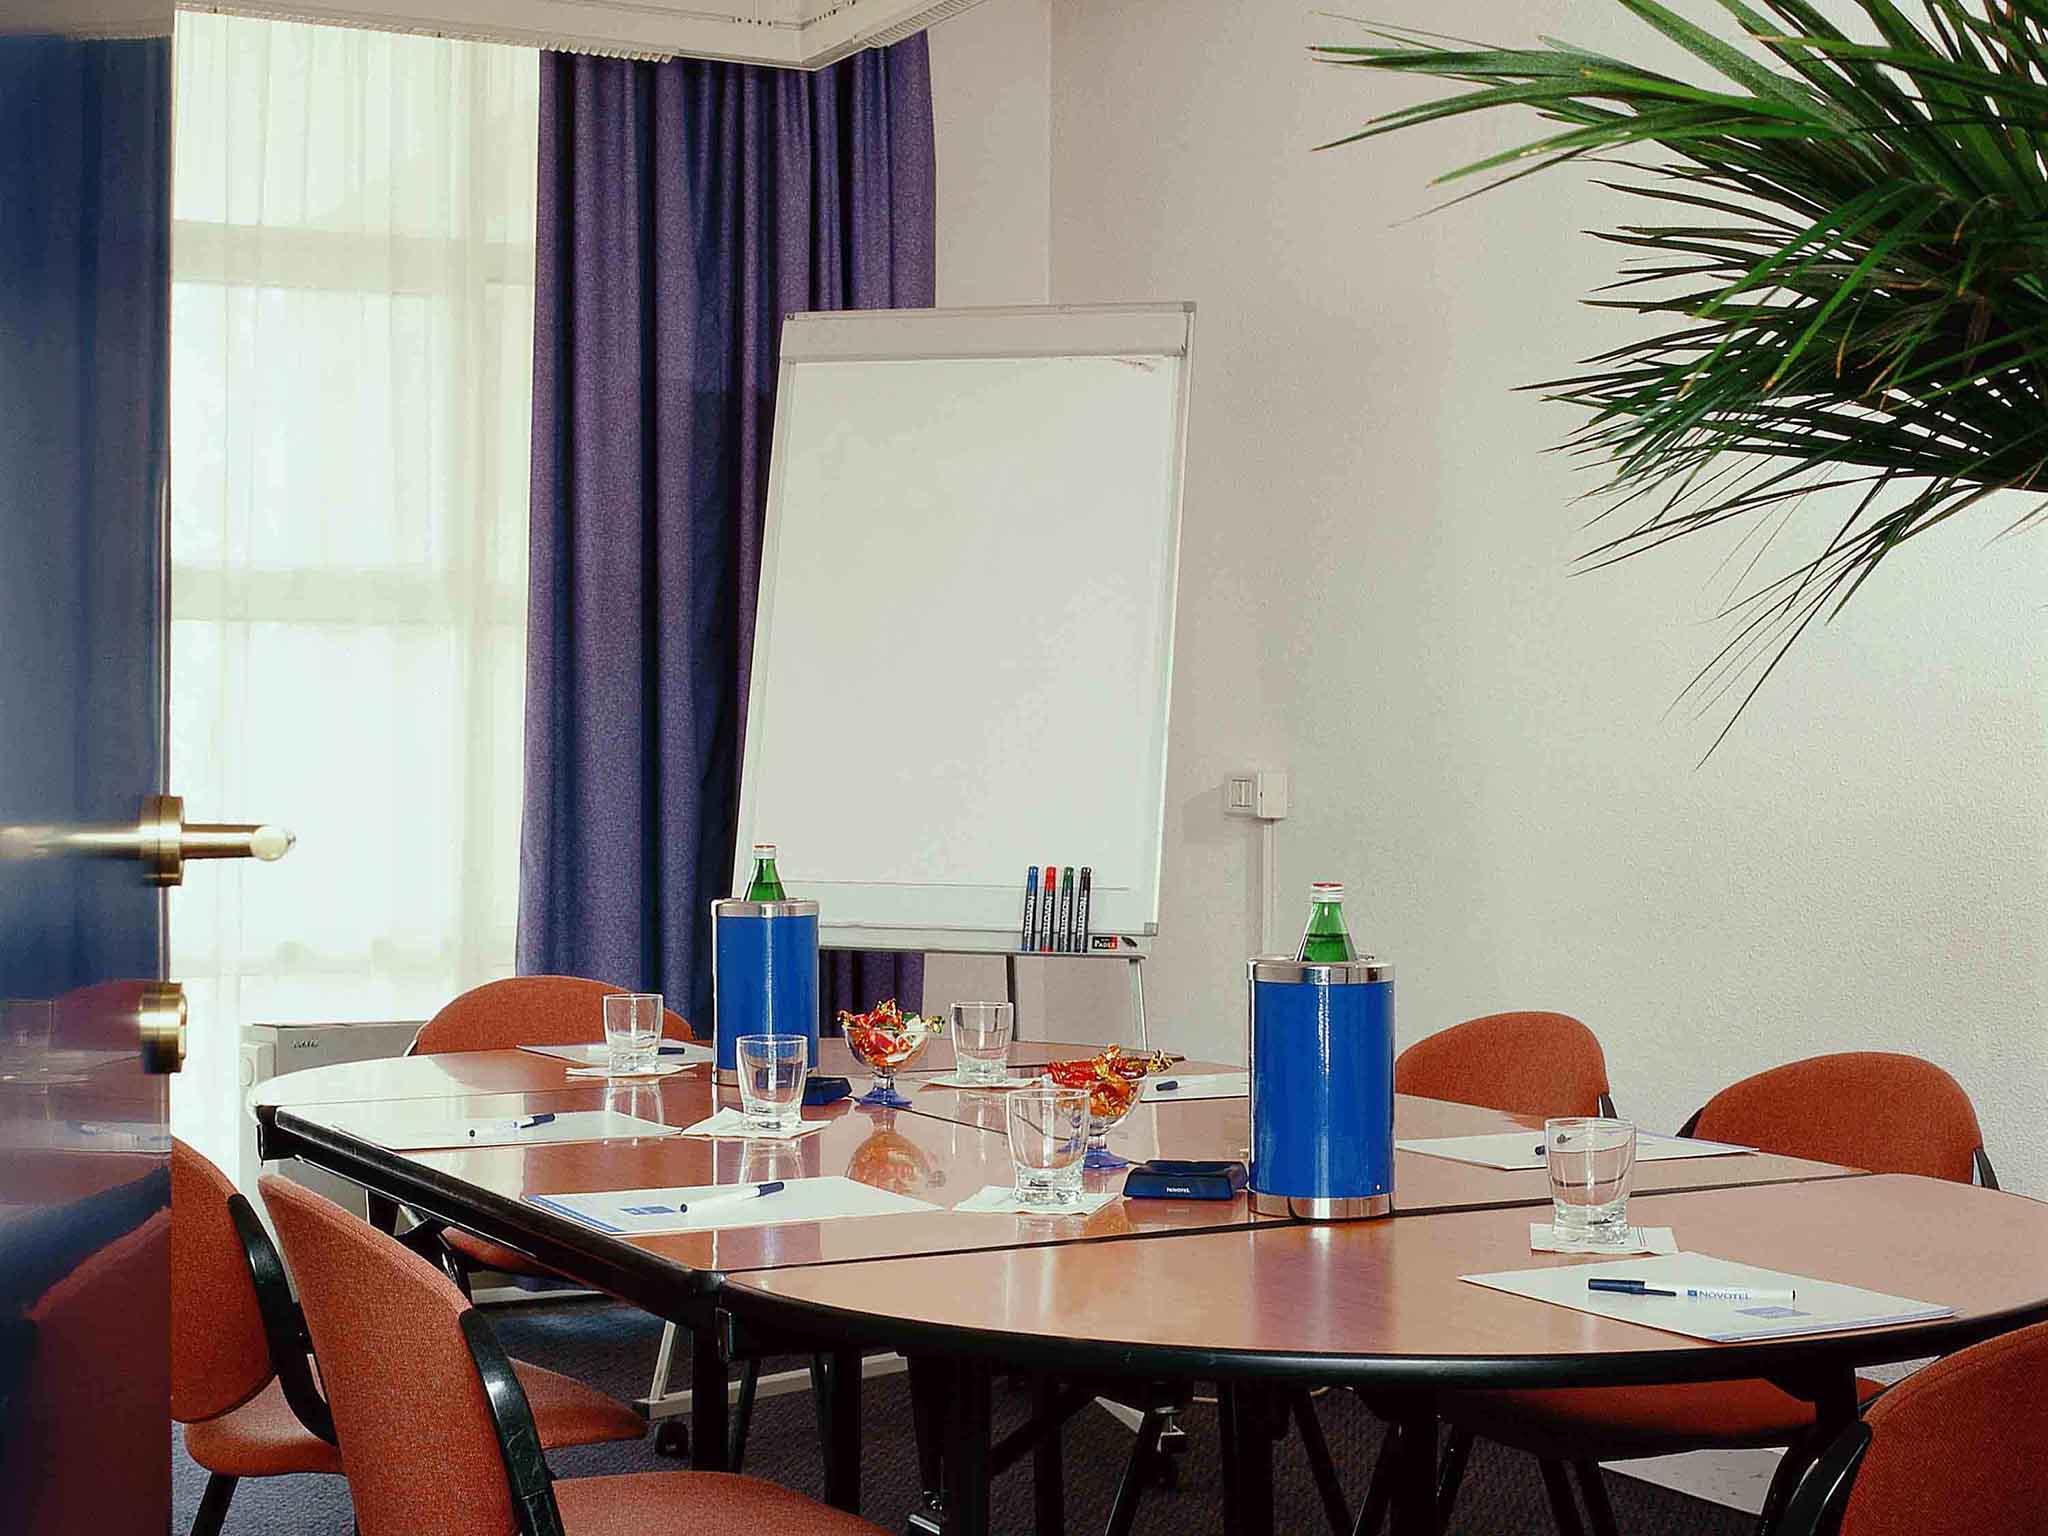 Sale Riunioni Firenze : Hotel novotel firenze nord aeroporto accorhot